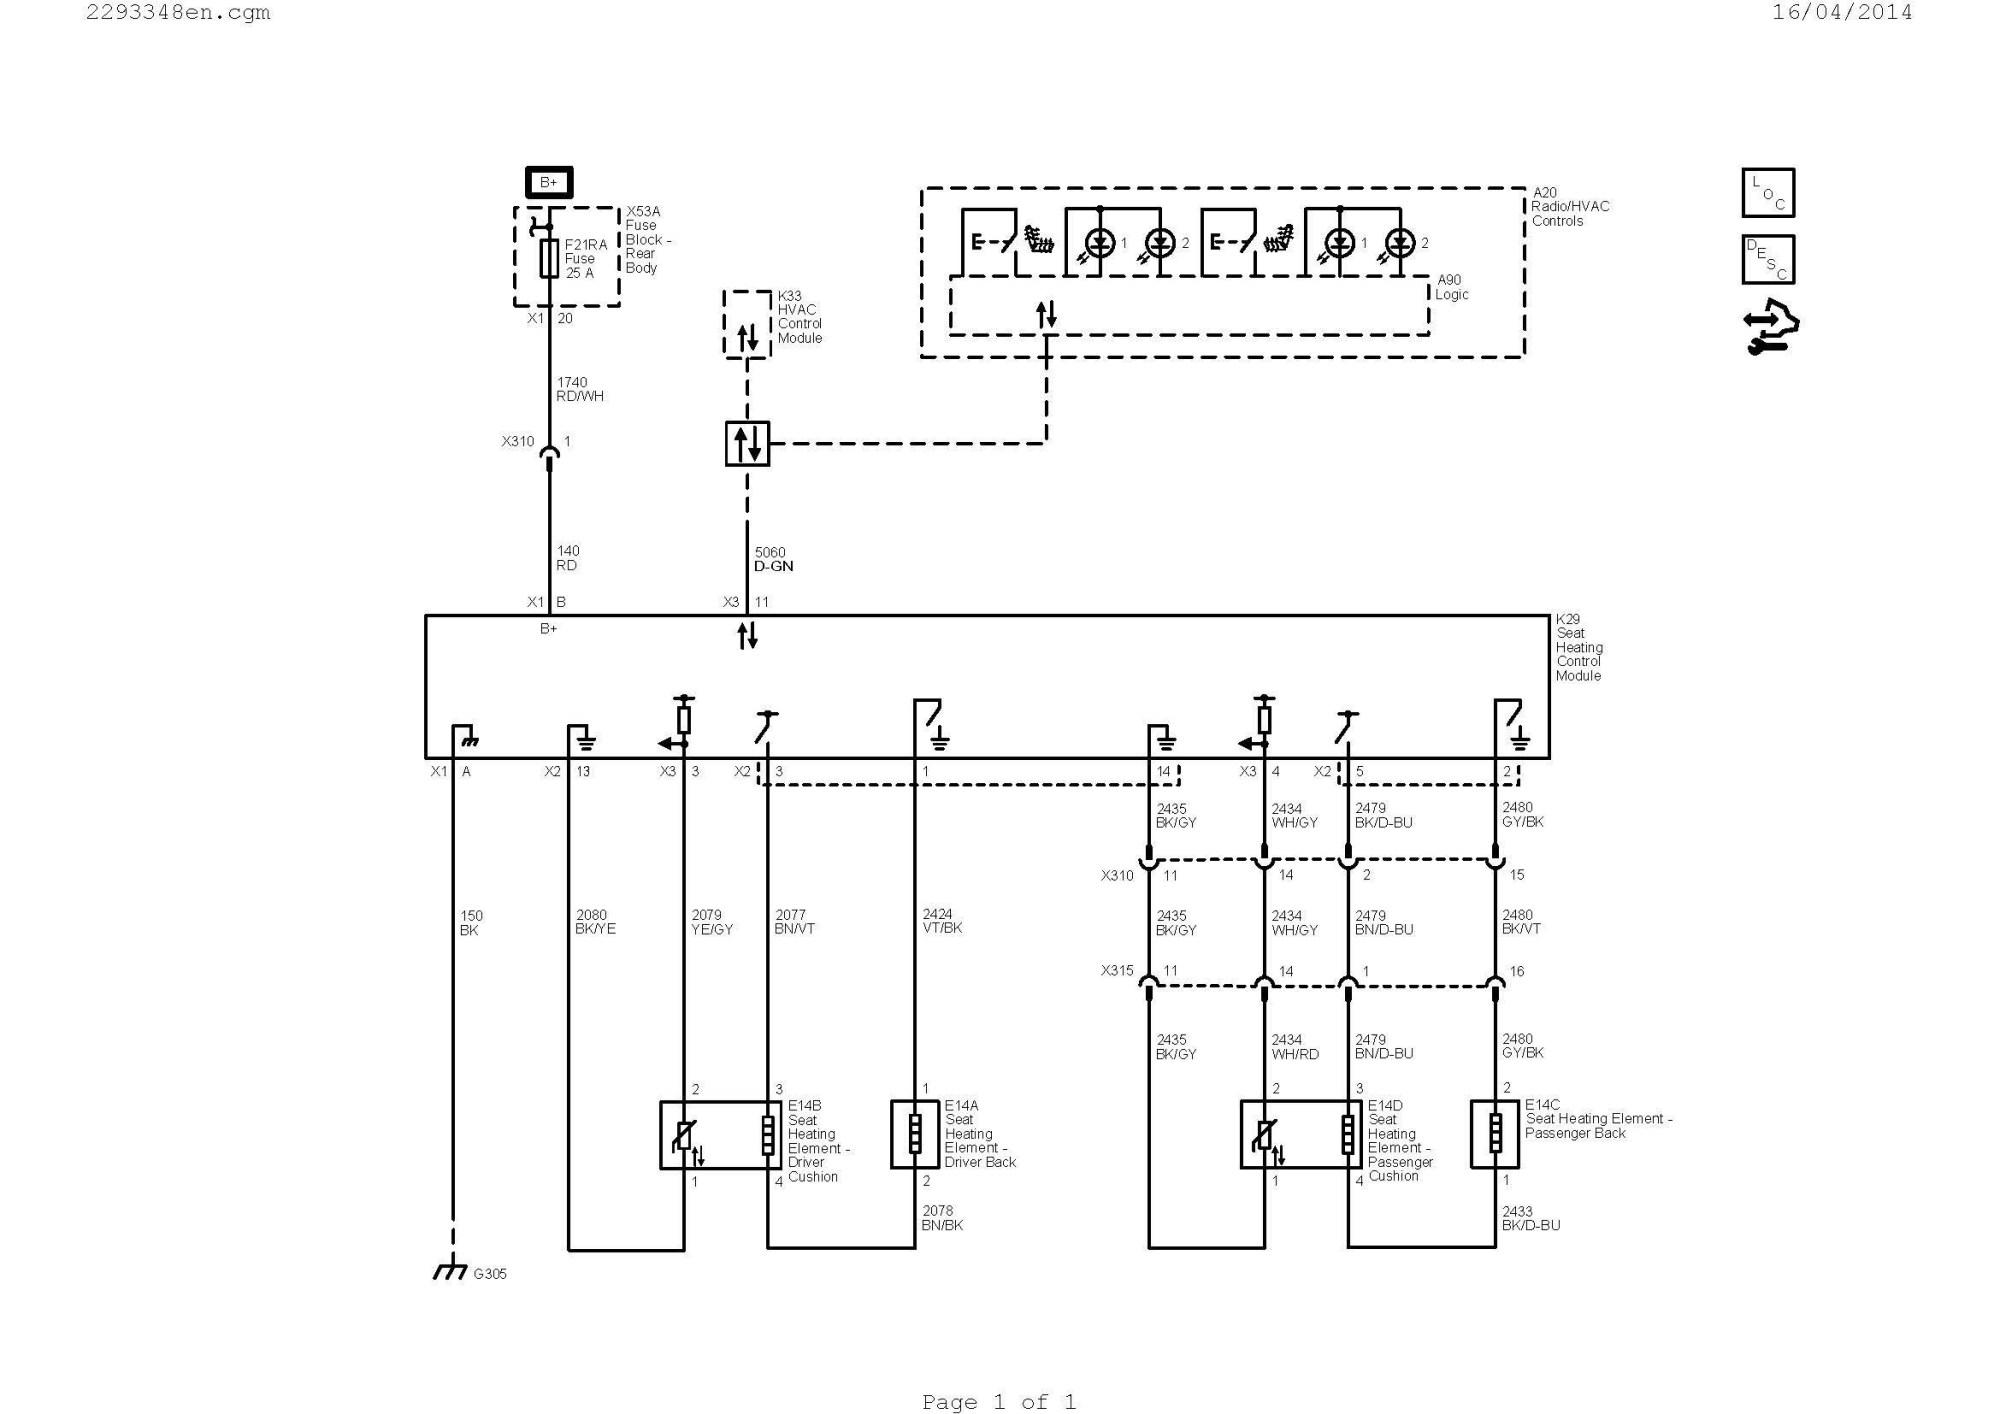 hight resolution of air handler fan relay wiring diagram hvac fan wiring diagram new hvac relay wiring diagram